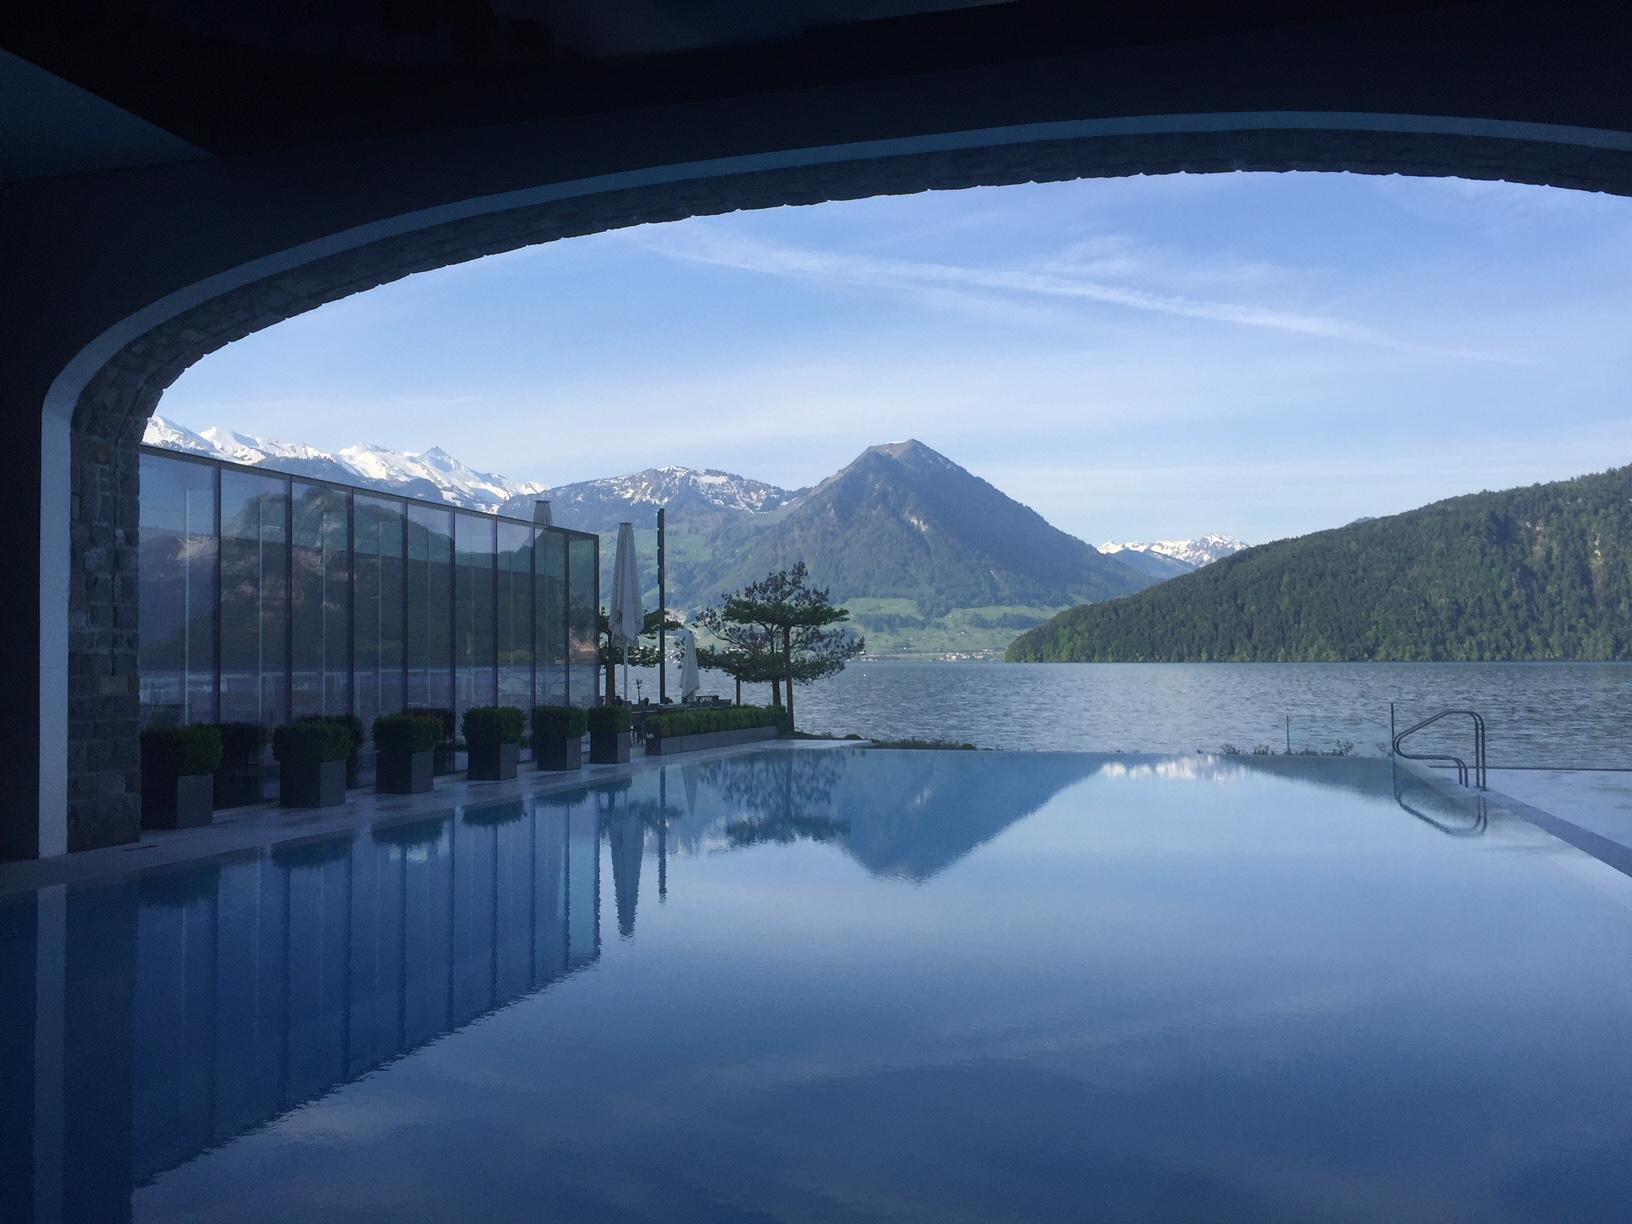 The absolutely stunning Park Hotel Vitznau outside of Lucerne, Switzerland